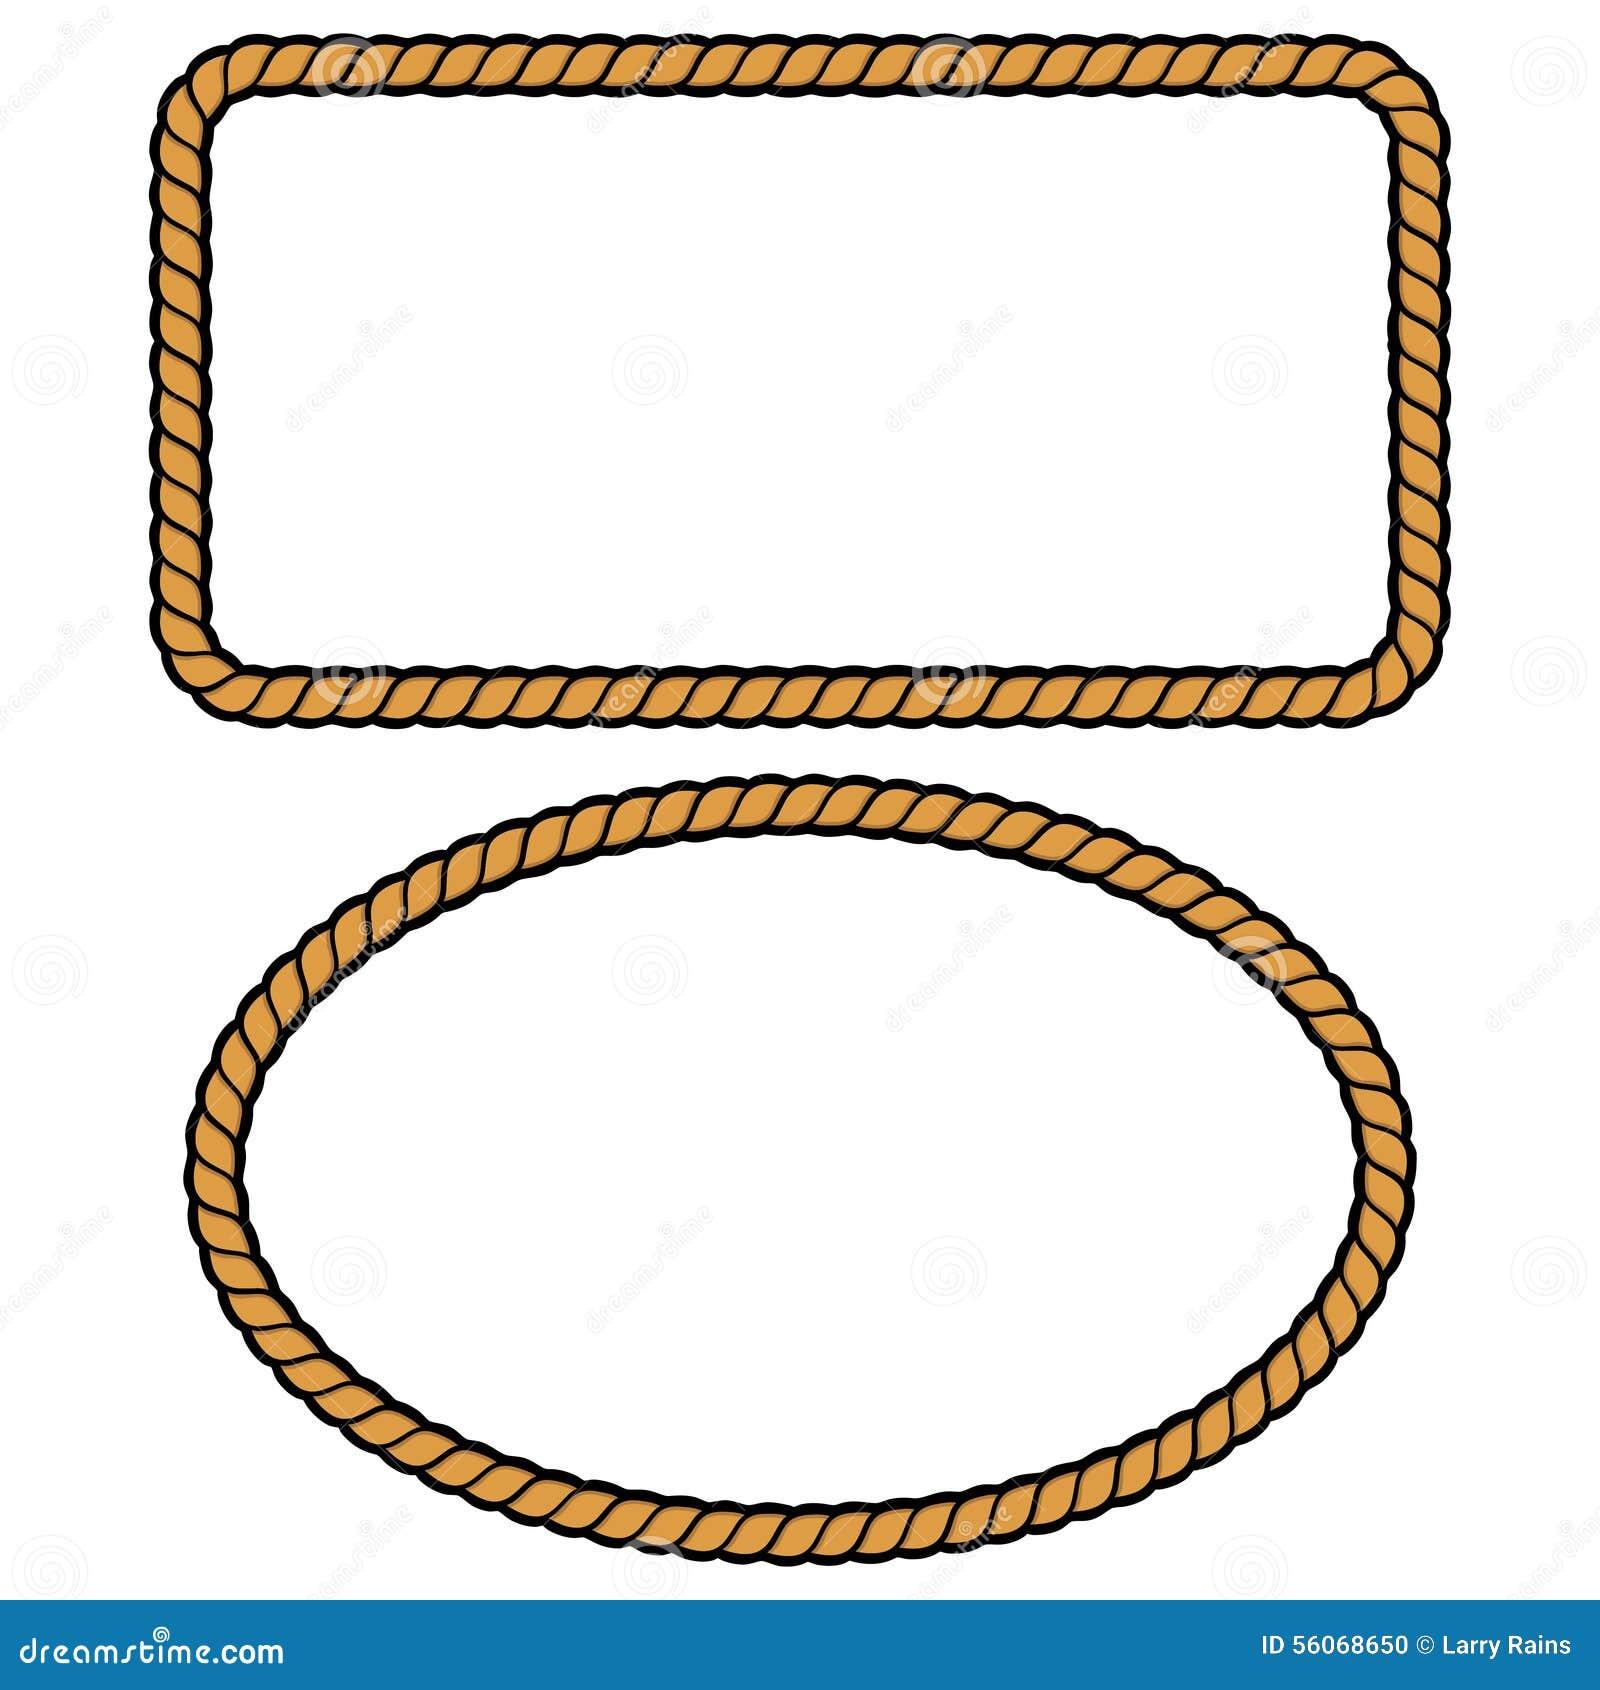 rope border illustations stock vector illustration of cord 56068650 rh dreamstime com rope vector art rope vector eps